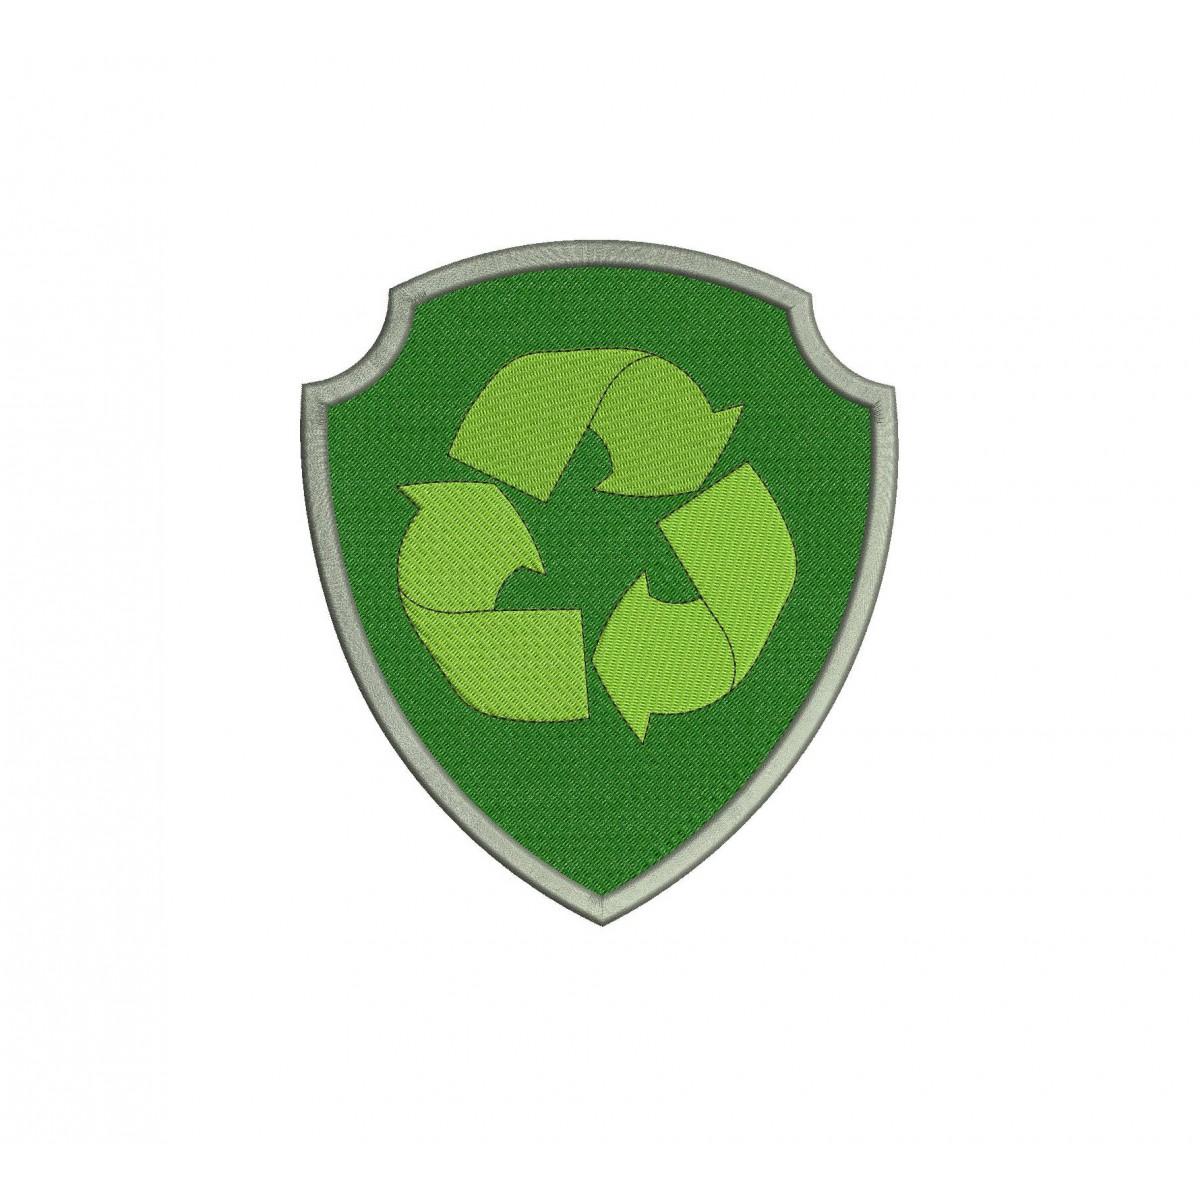 rocky badge logo paw patrol full embroidery design